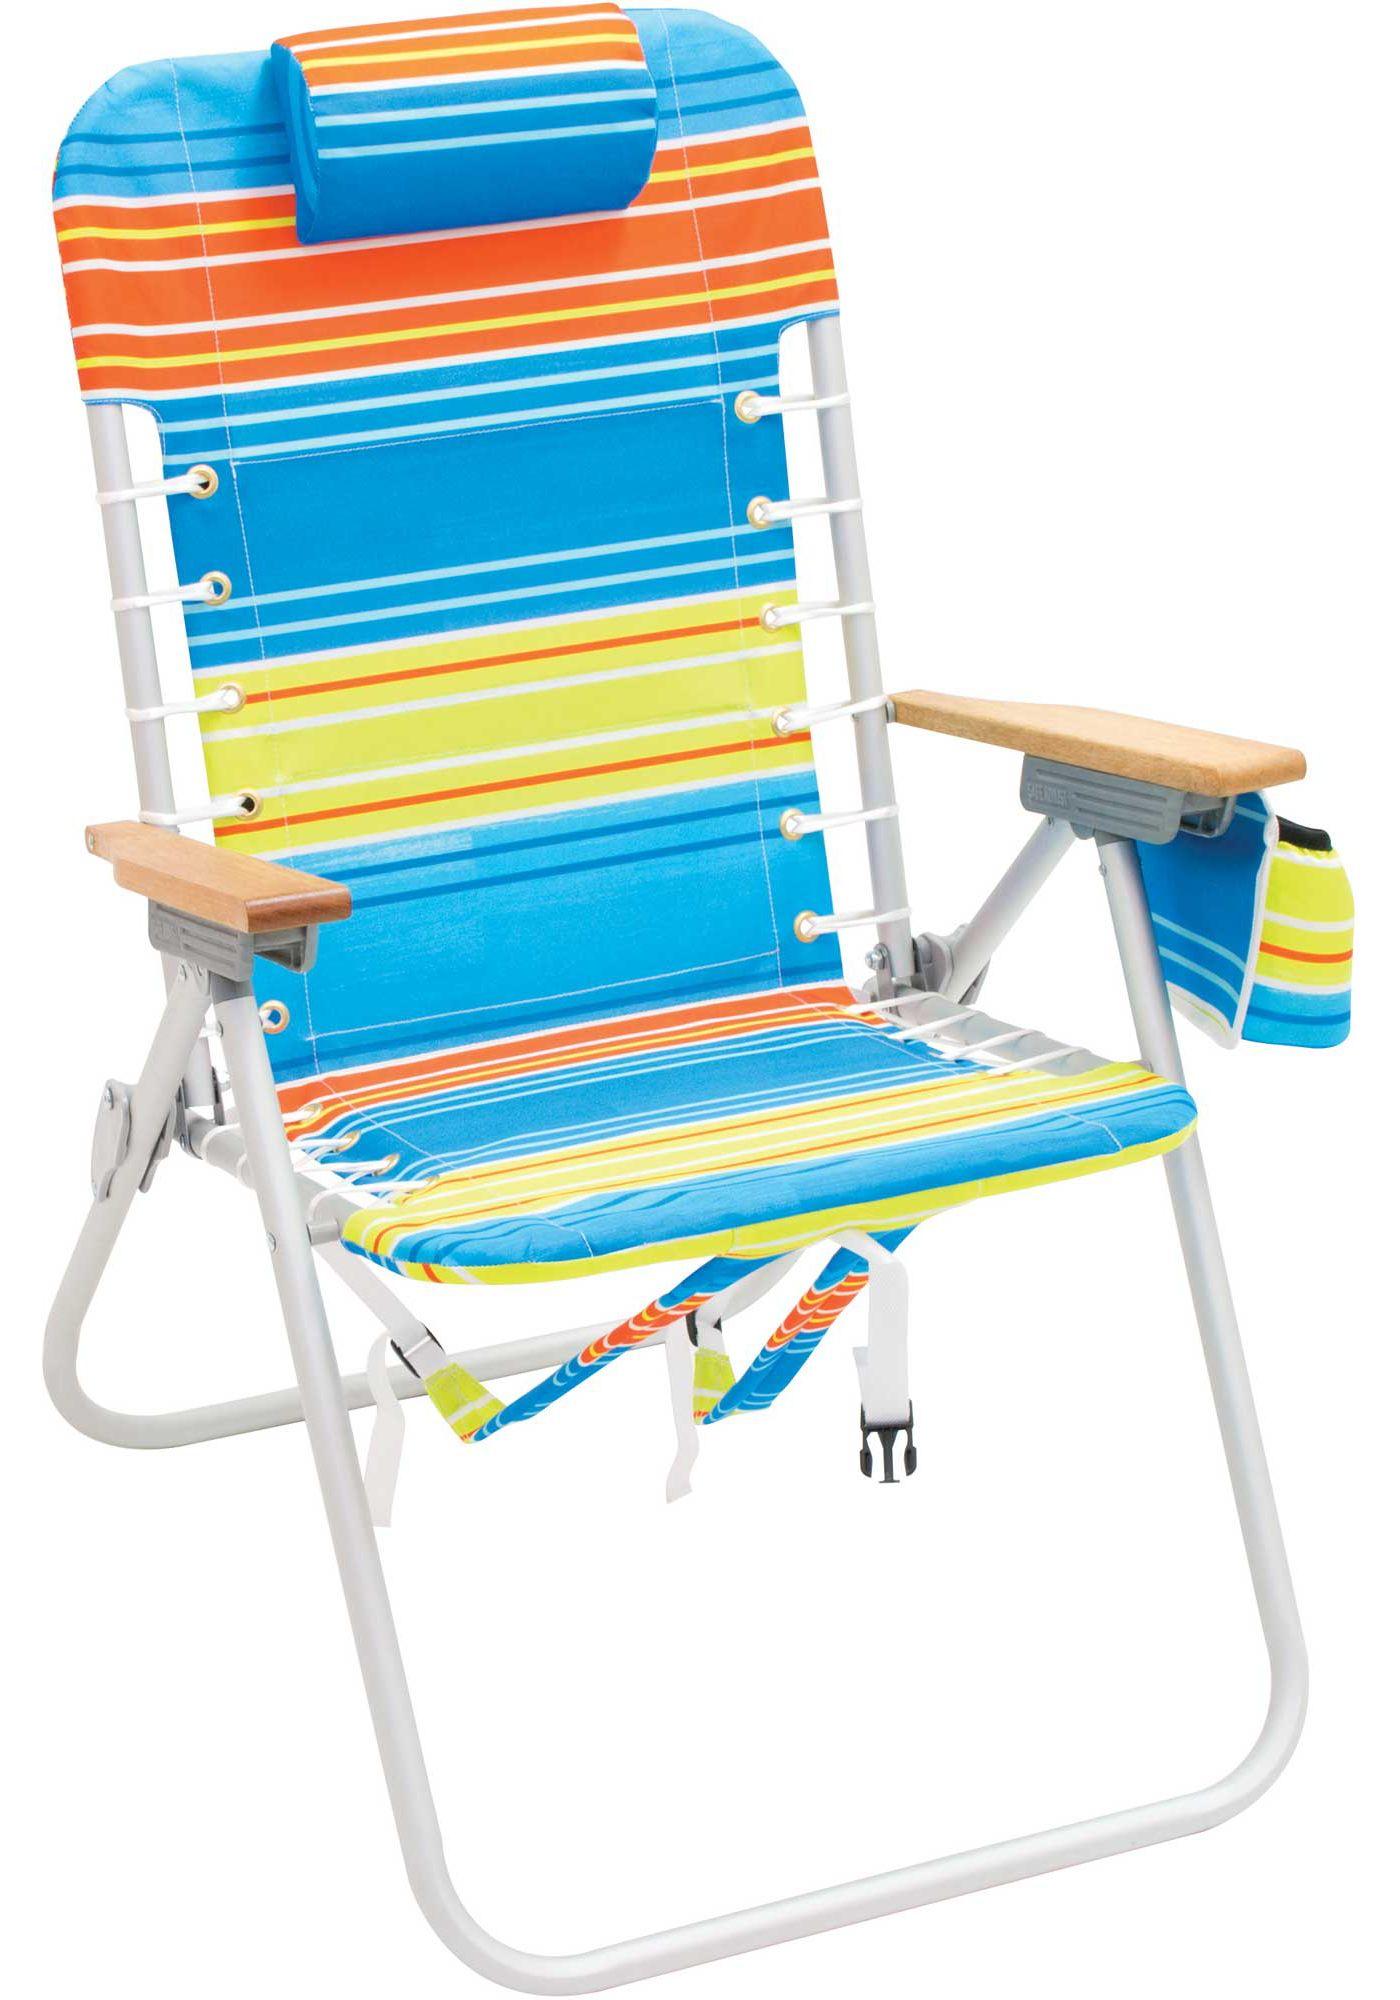 RIO 4-Position Backpack Beach Chair